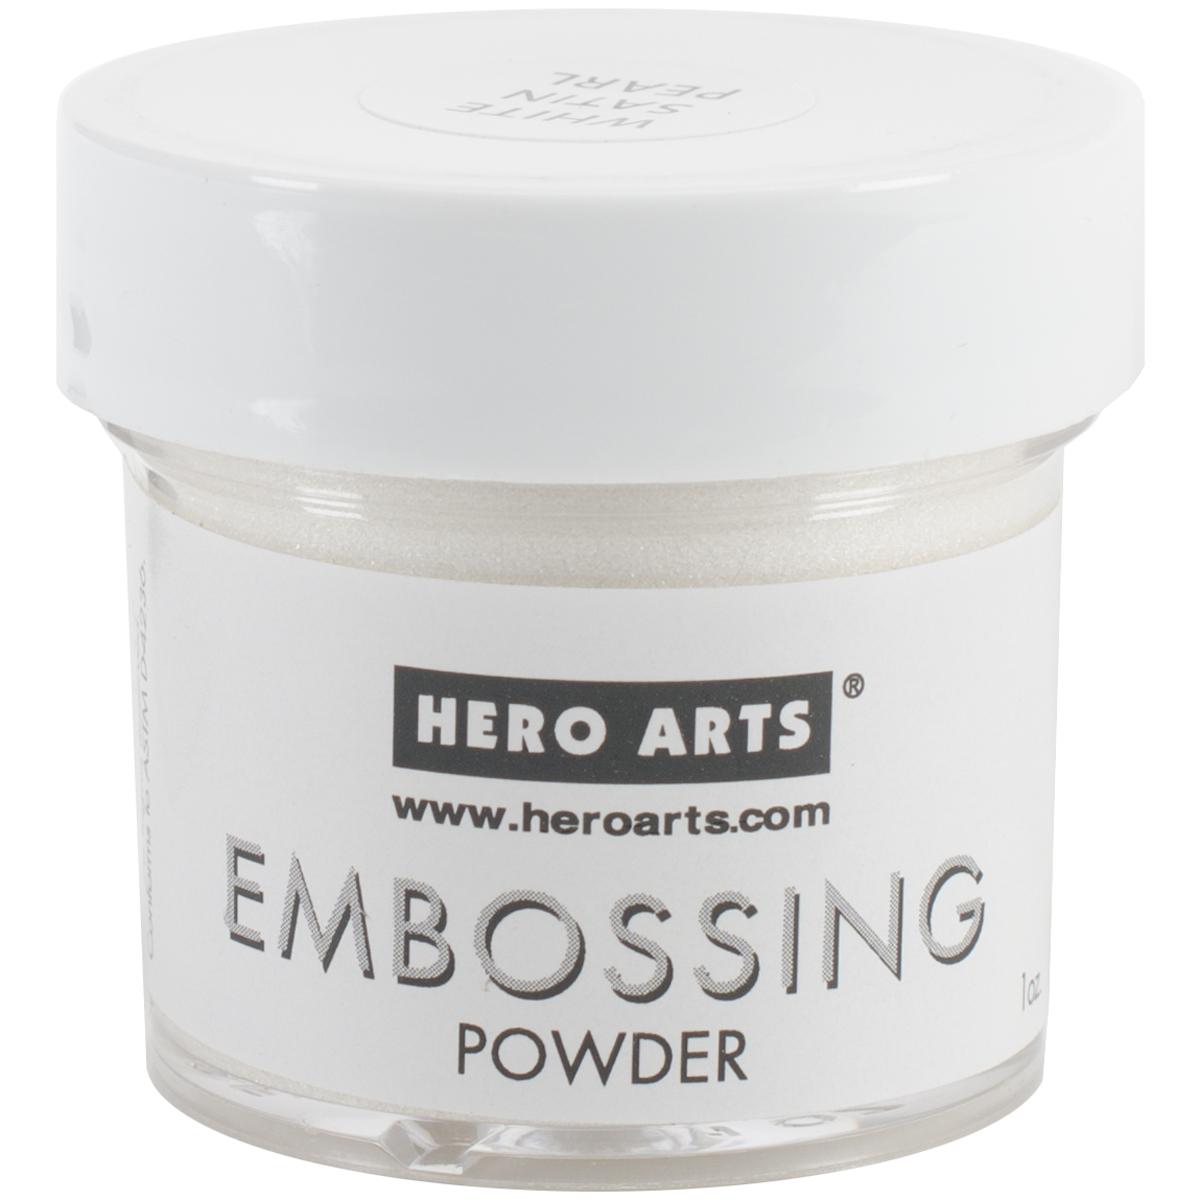 Hero Arts Embossing Powder -White Satin Pearl